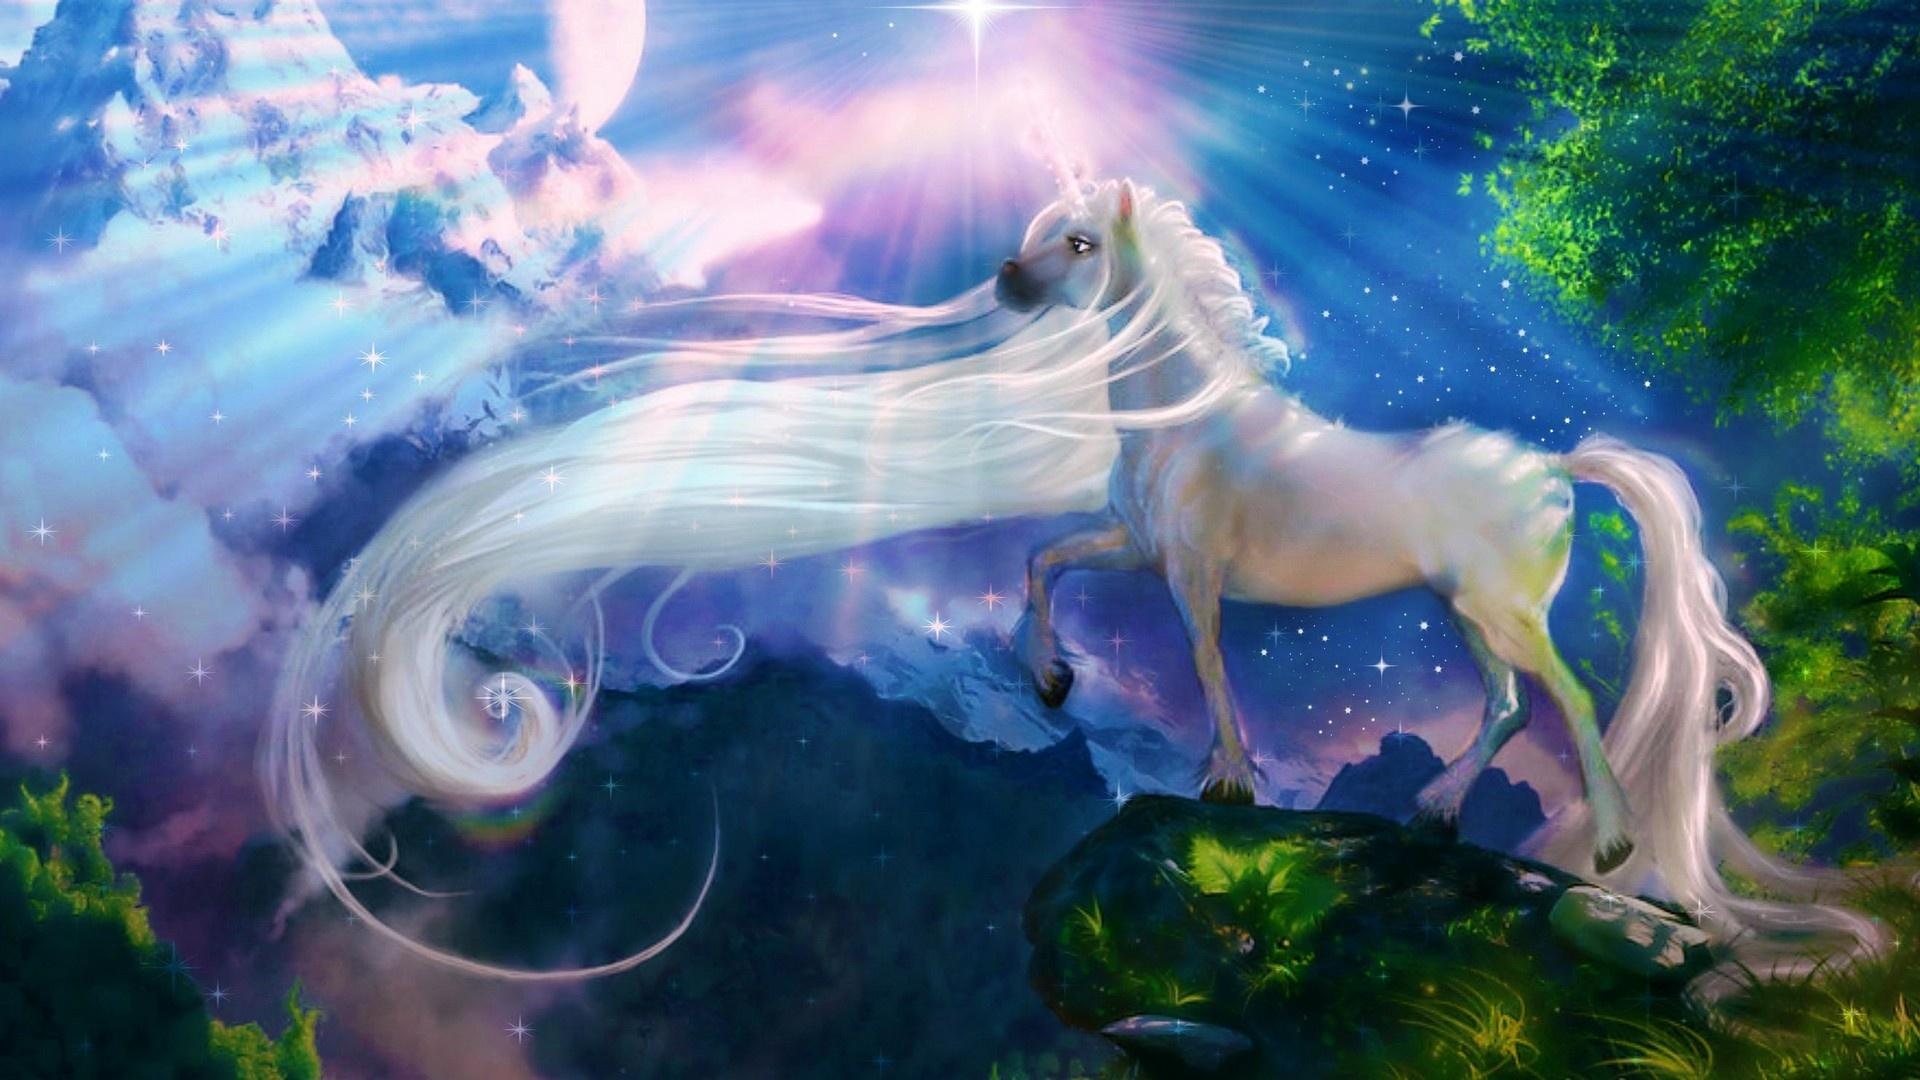 Magic Horses Image